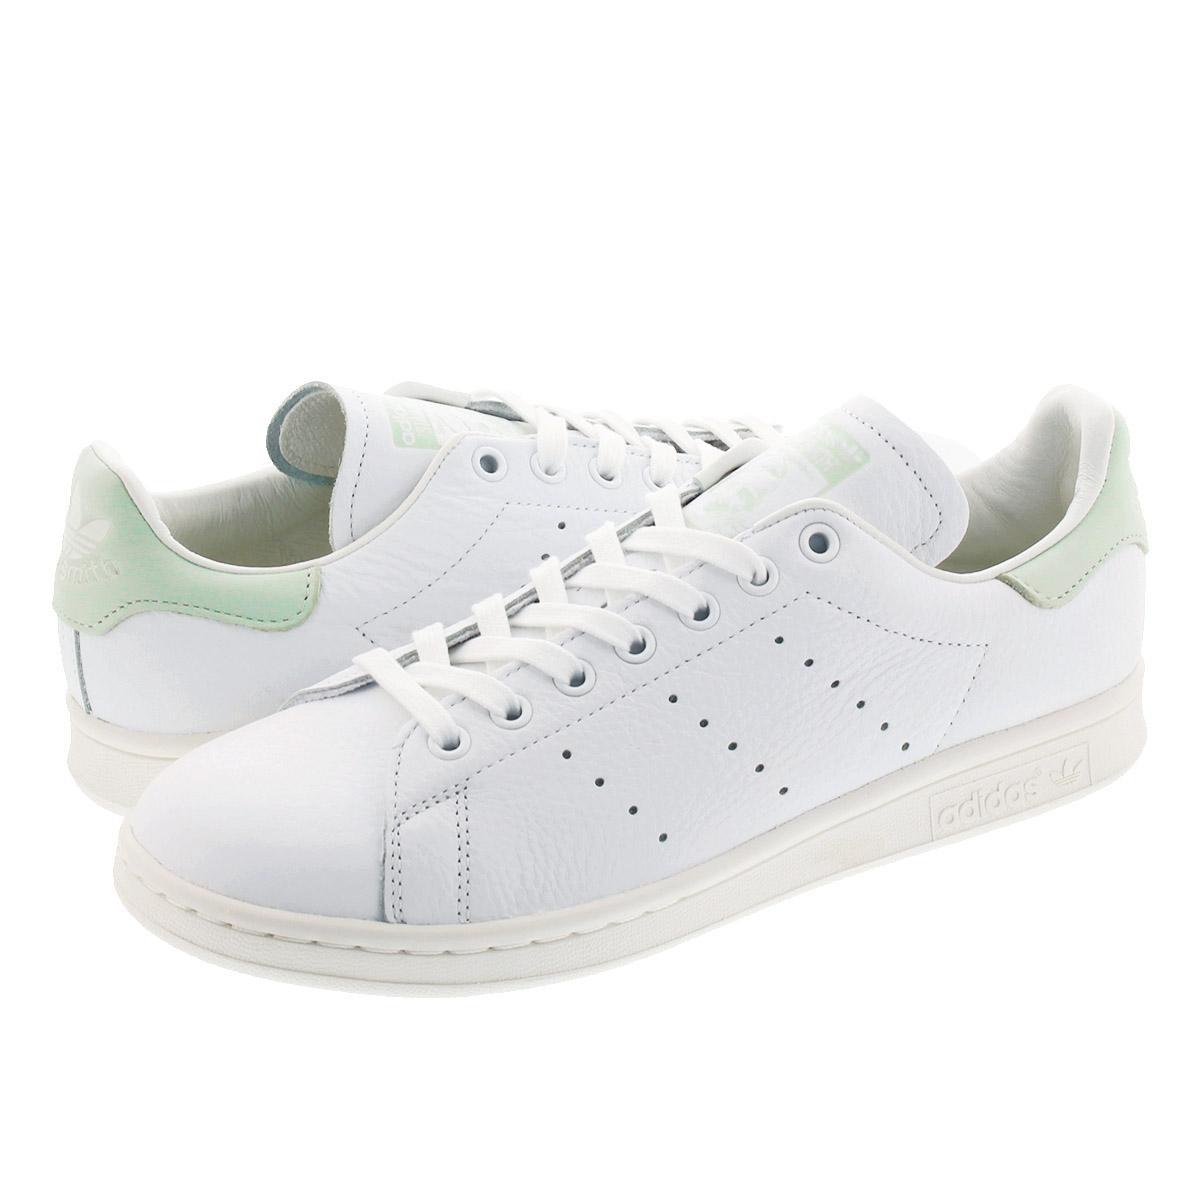 purchase cheap 40988 05ab7 adidas STAN SMITH Adidas Stan Smith RUNNING WHITE/LINEN GREEN/OFF WHITE  ef9289